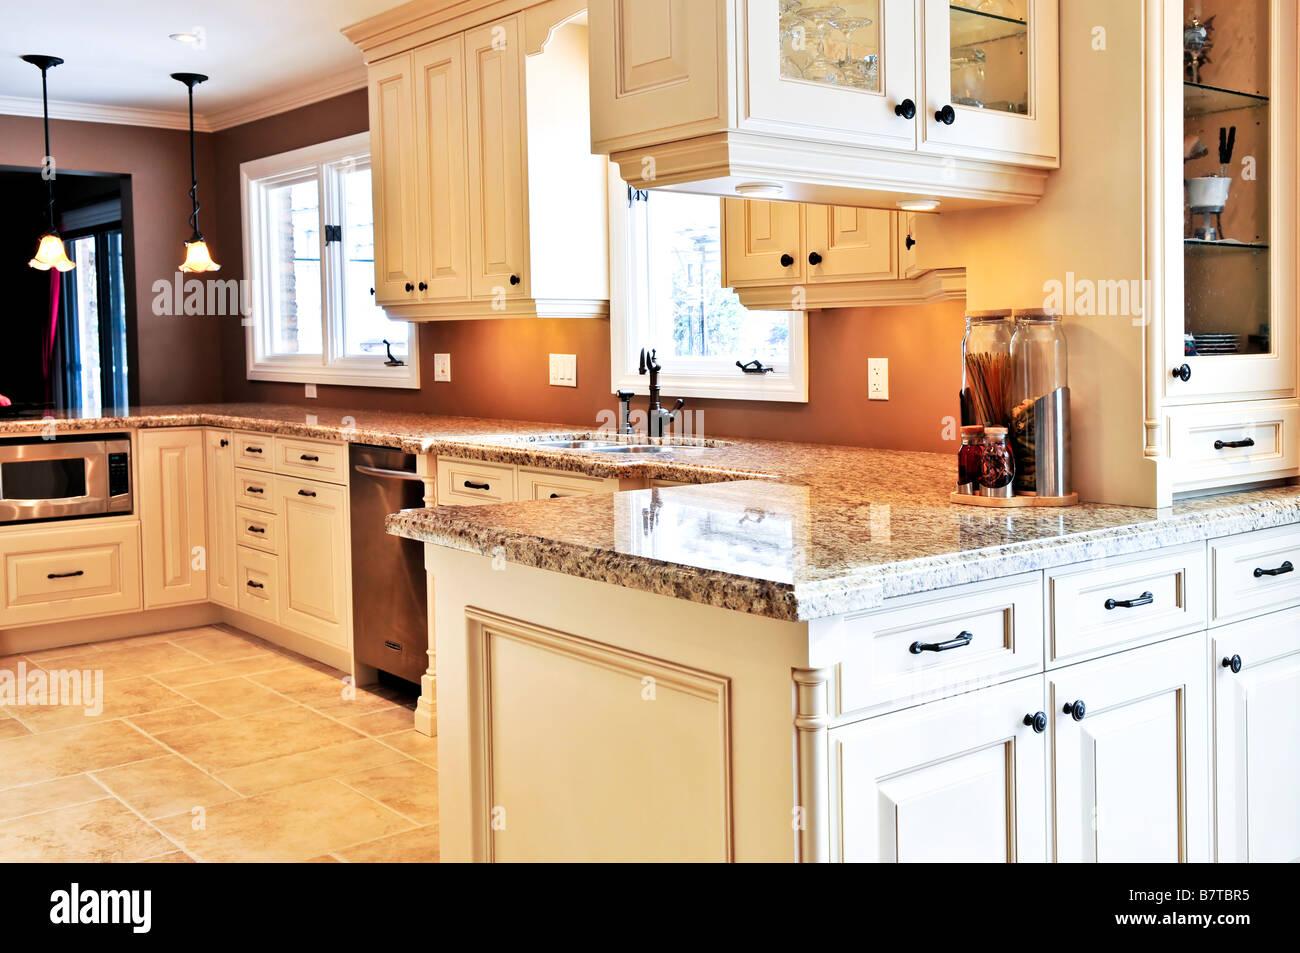 Superbe Interior Of Modern Luxury Kitchen With Granite Countertop